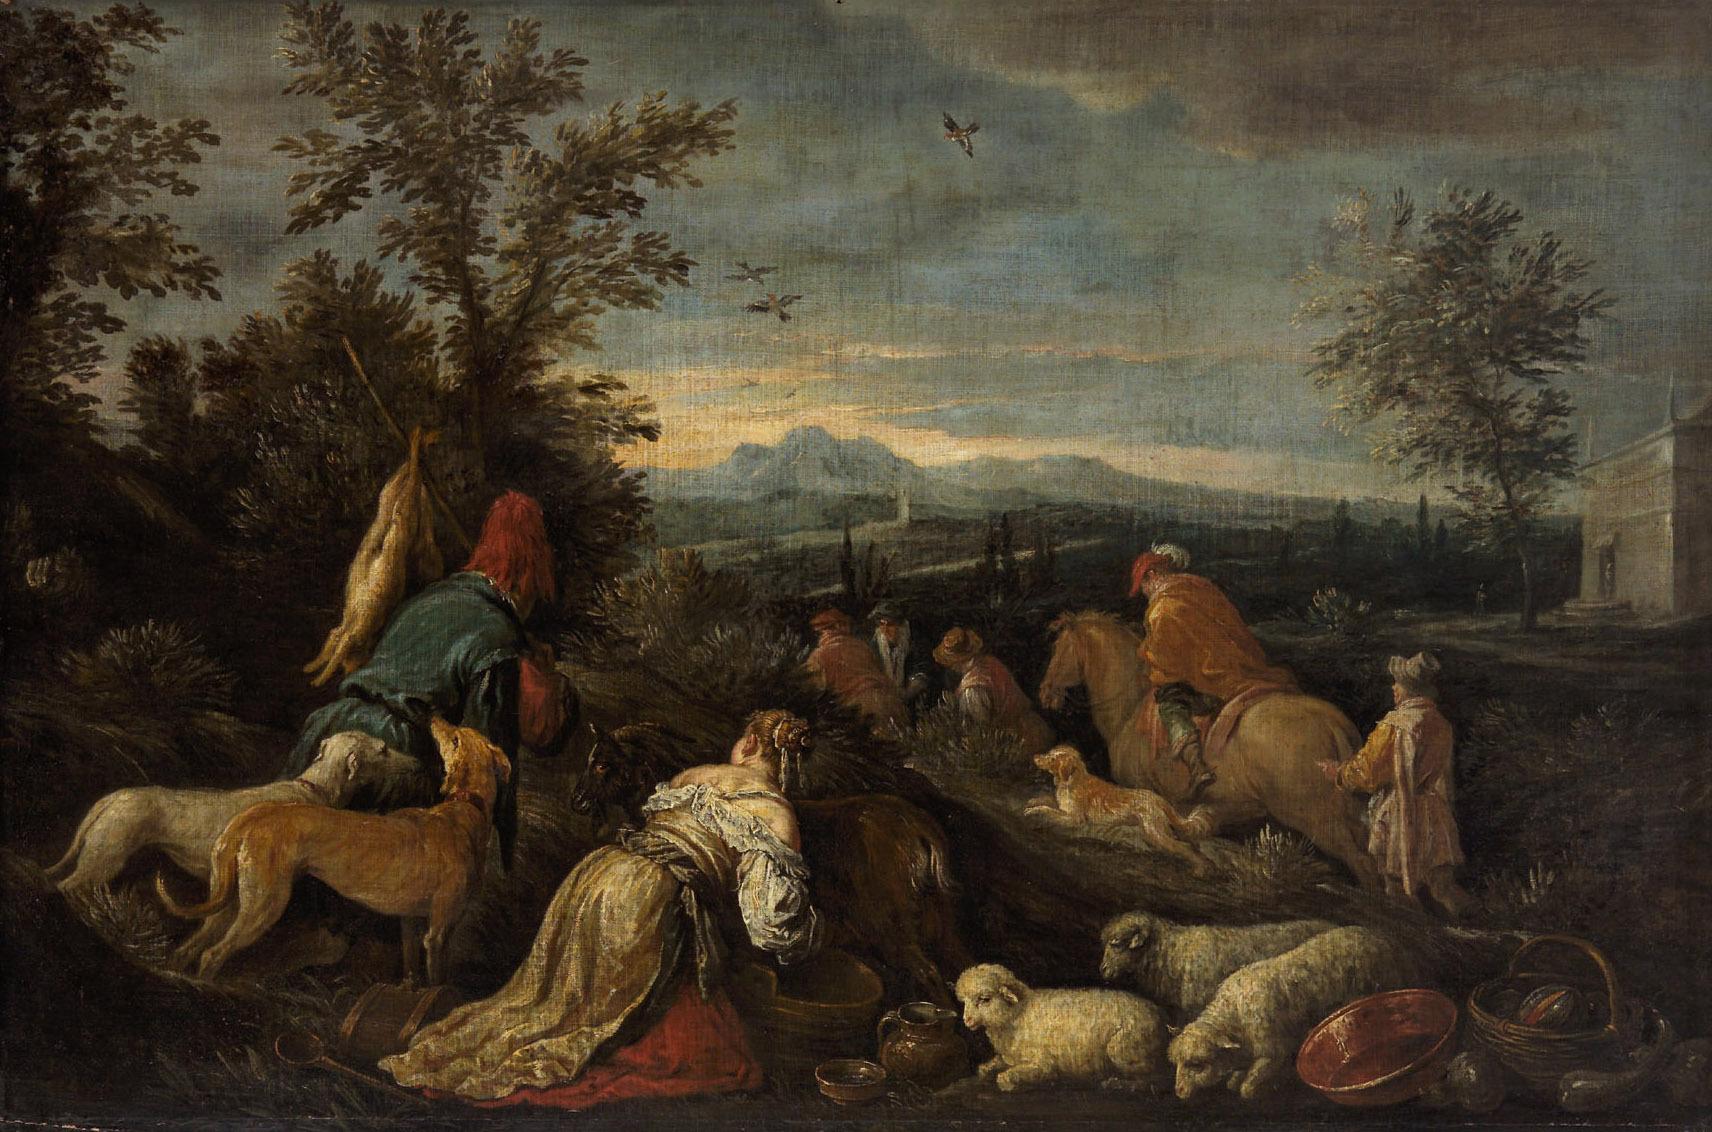 Jagd von Francesco da Ponte, gen. Francesco Bassano